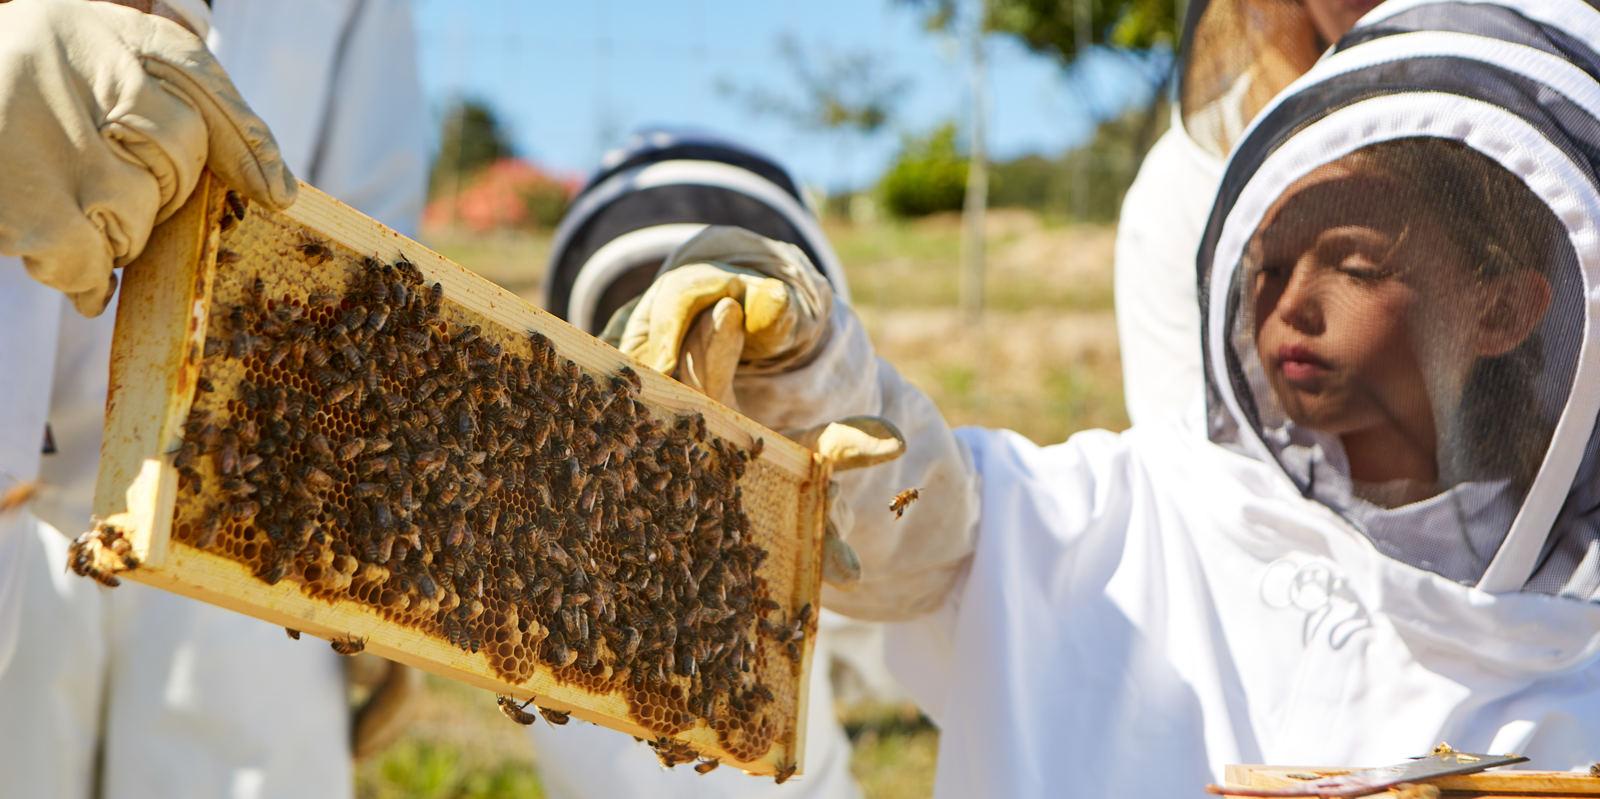 Carmel Valley Ranch_Activities_World of Bees_child_little girl_1641_GJ